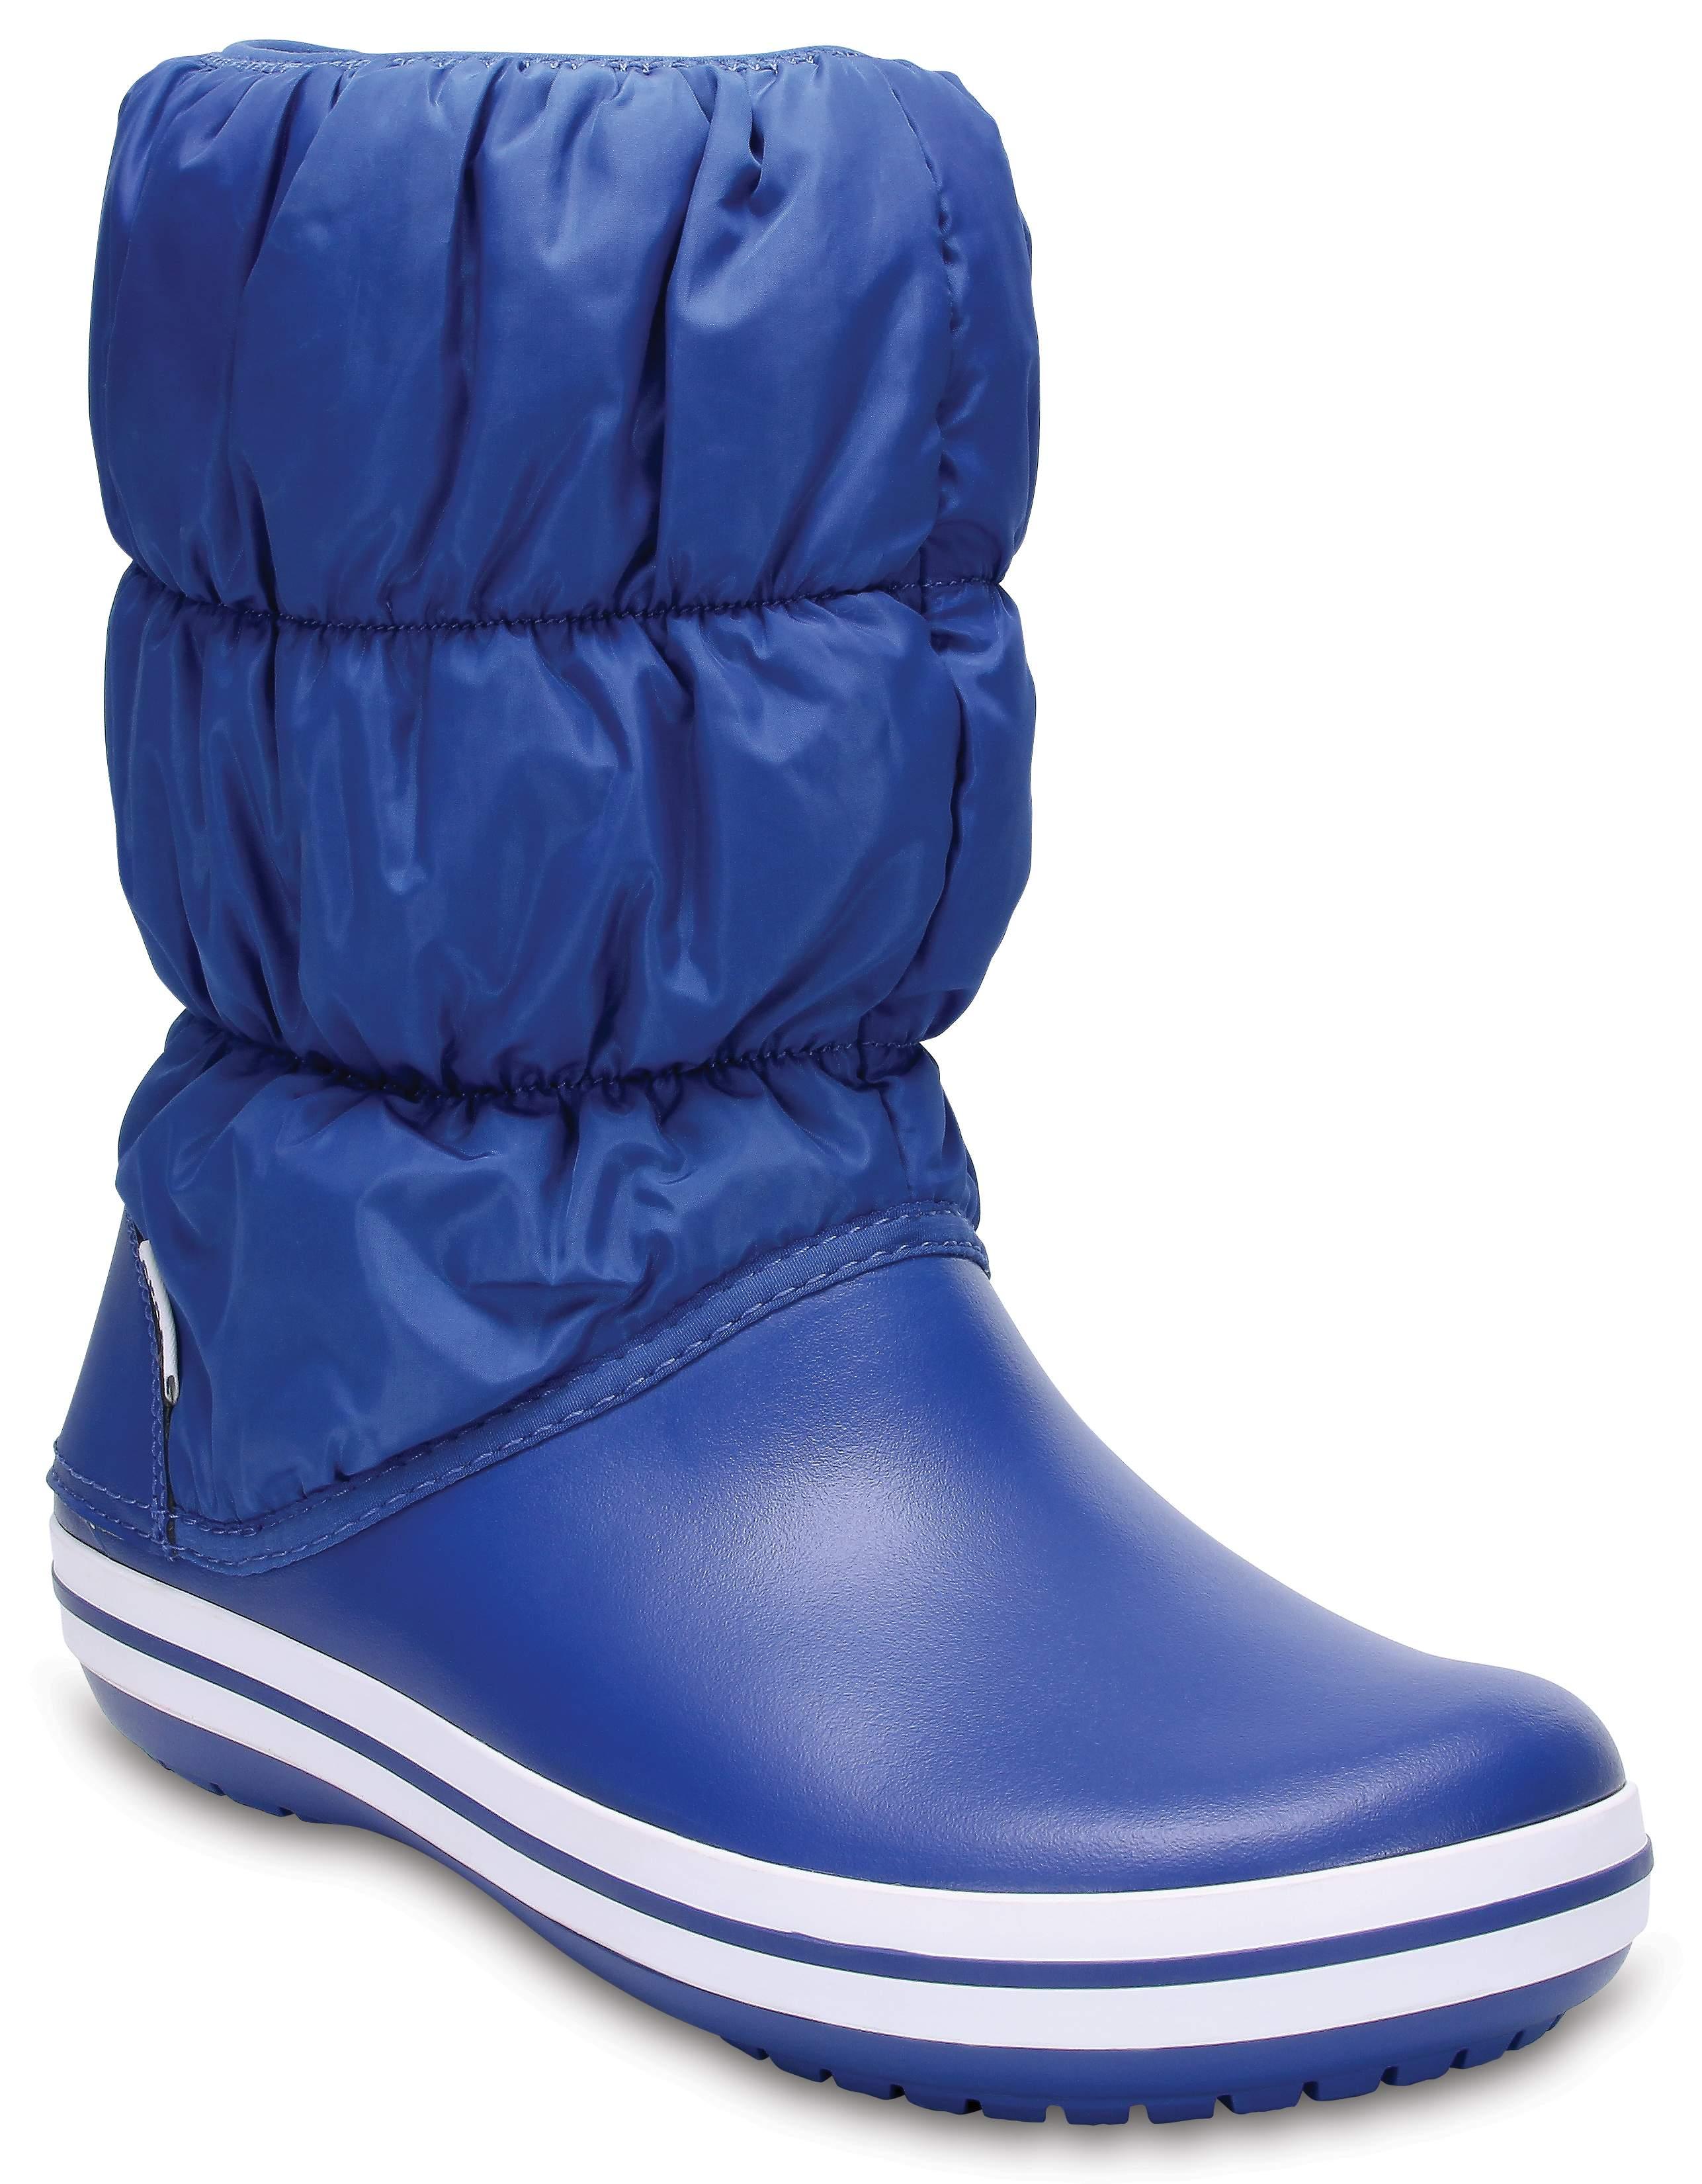 Winter Puff Boot Crocs